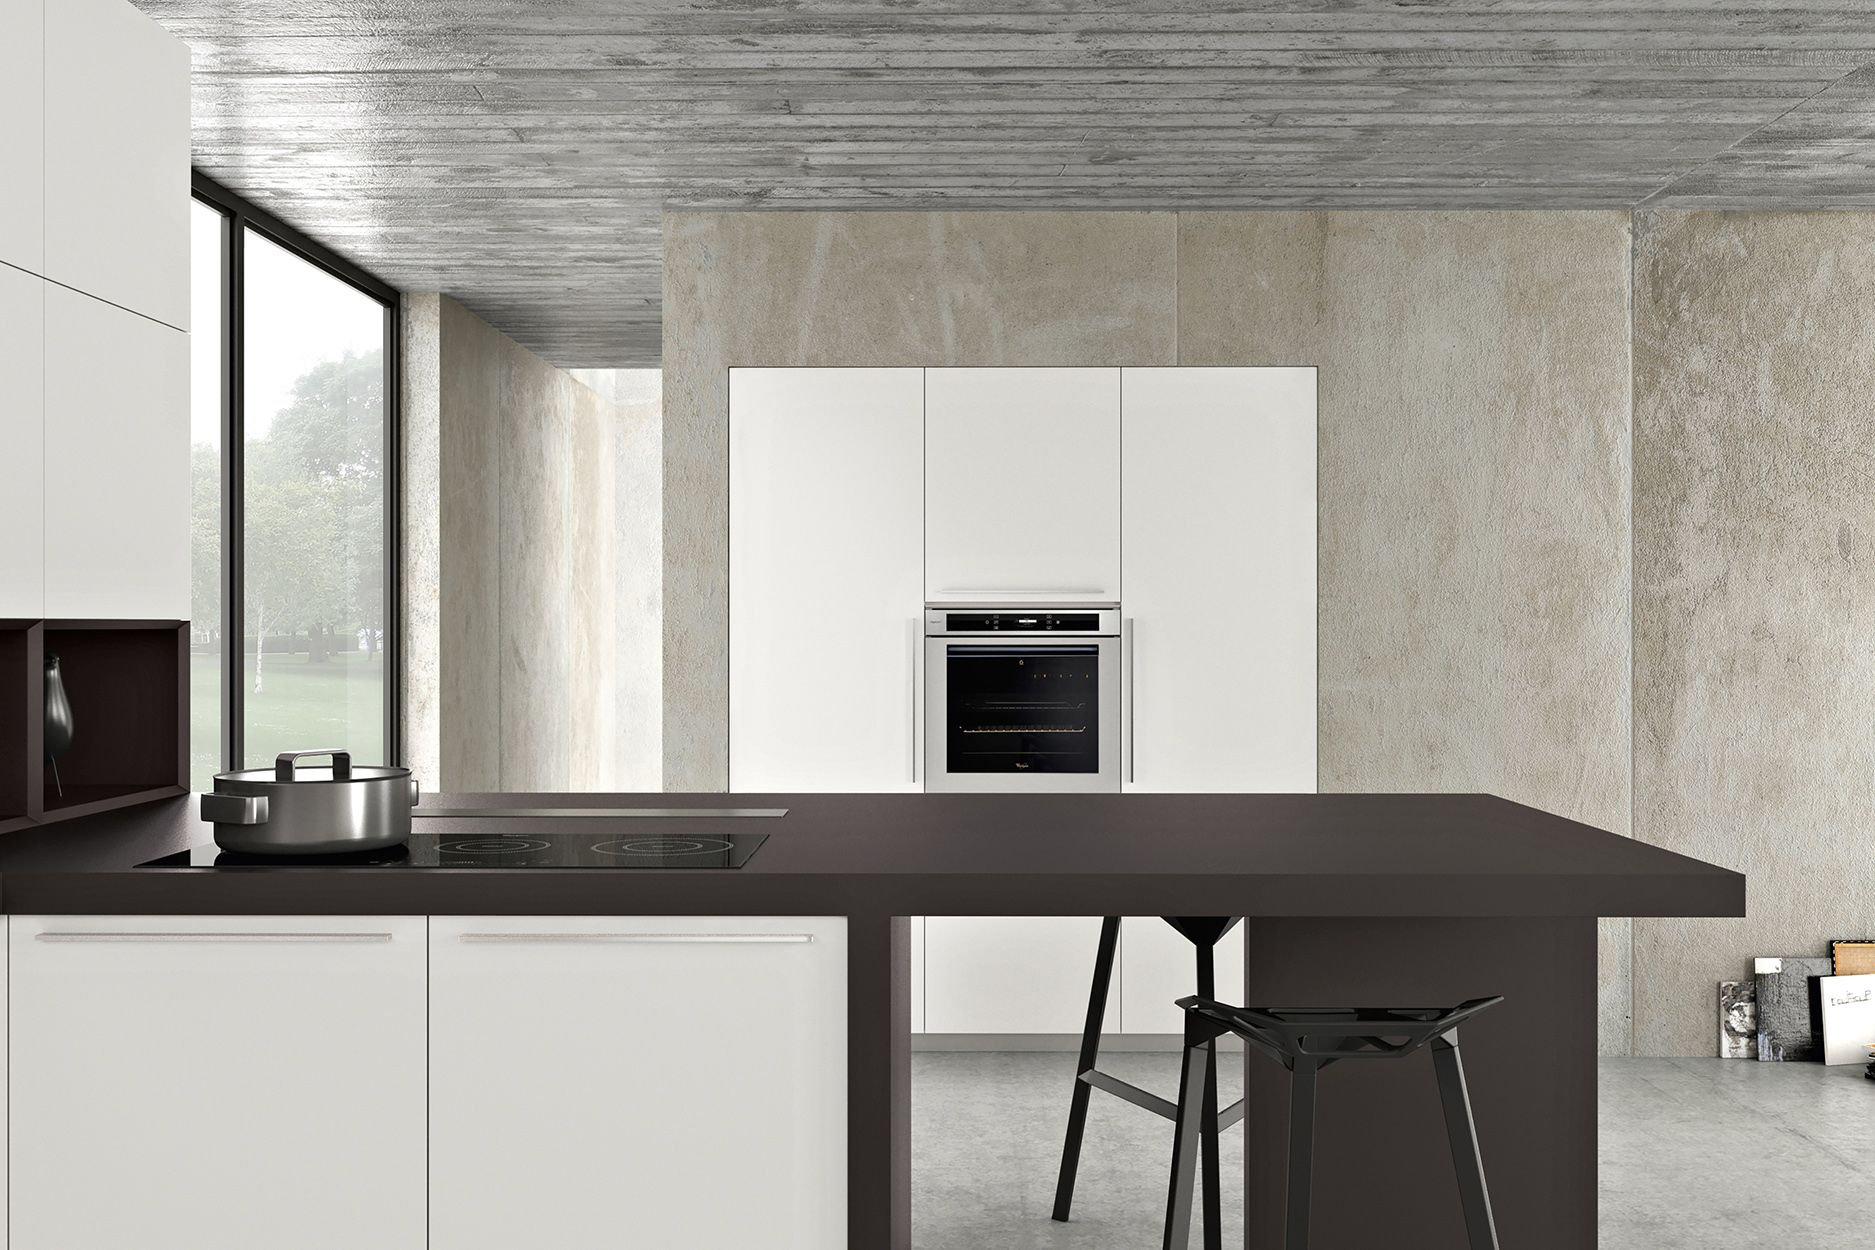 Armony cucine - Model Rho | Model_Kitchens with handles | Pinterest